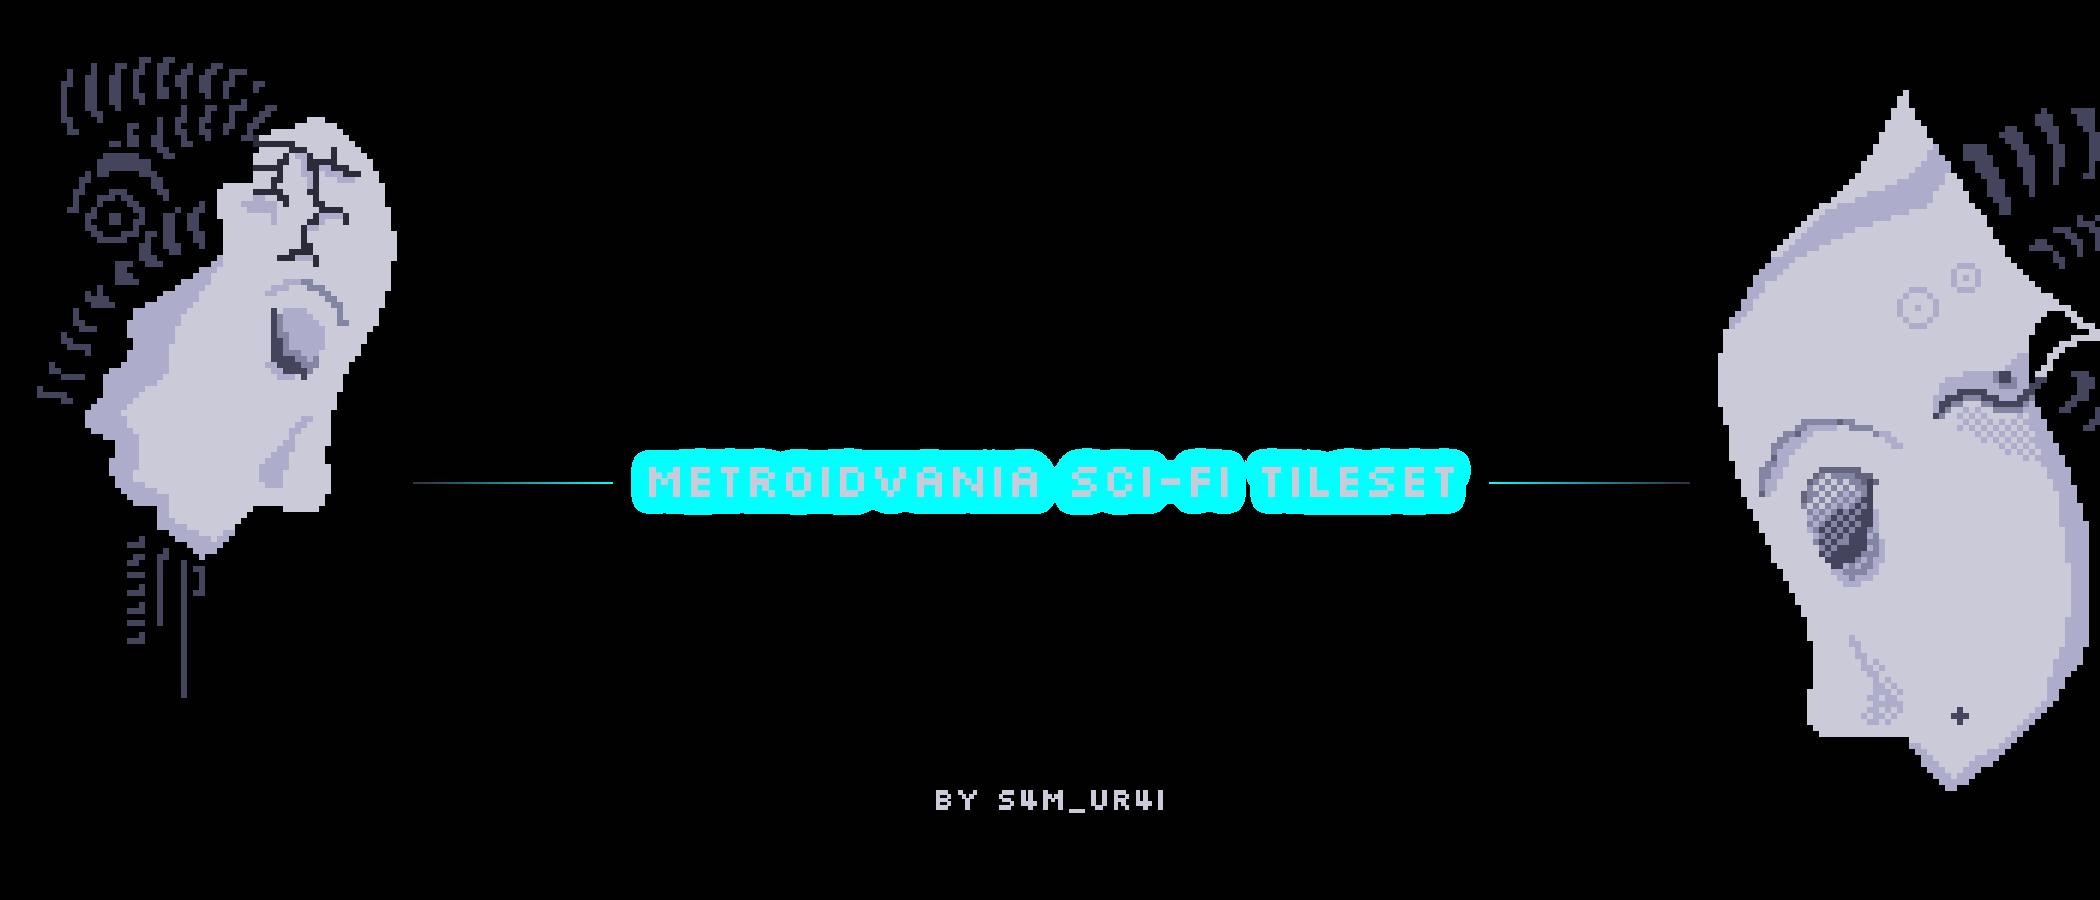 metroid / sci-fi tec-tileset 16x16